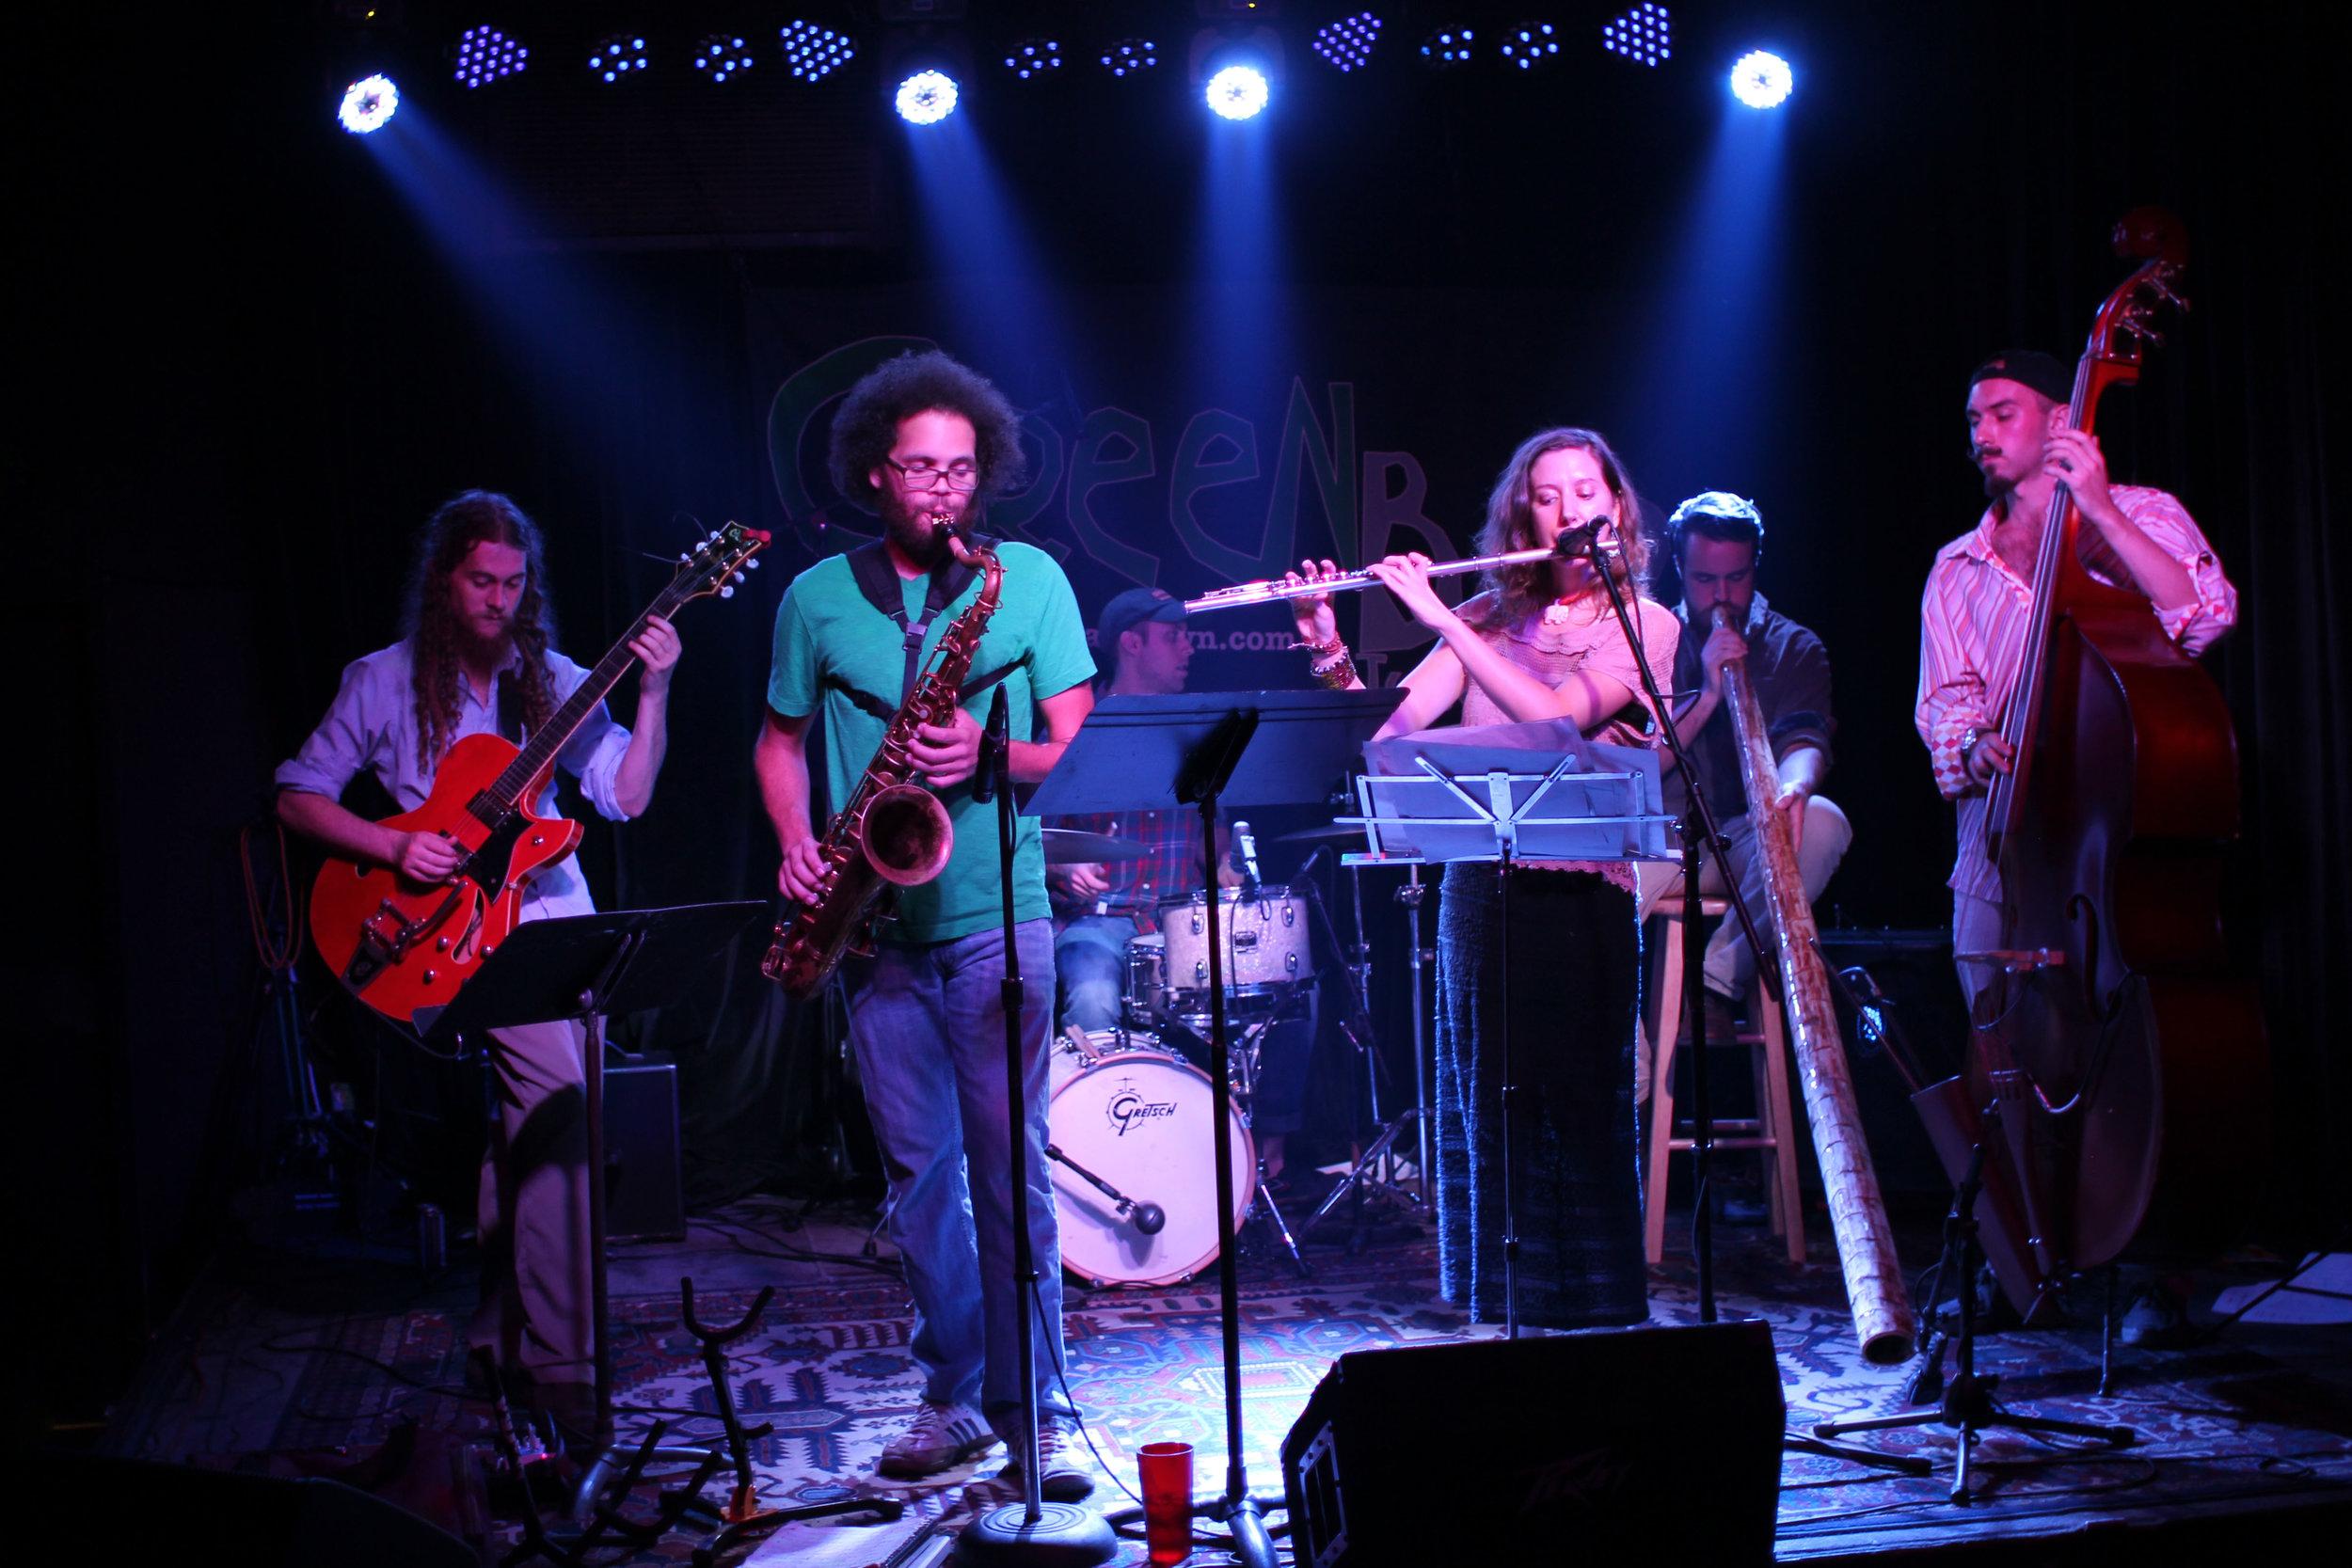 Medicine Men Quintet at our July Green Bar Show with guest Didgeridoo player Will MacGavin    photo creds: Lauren Musgrove